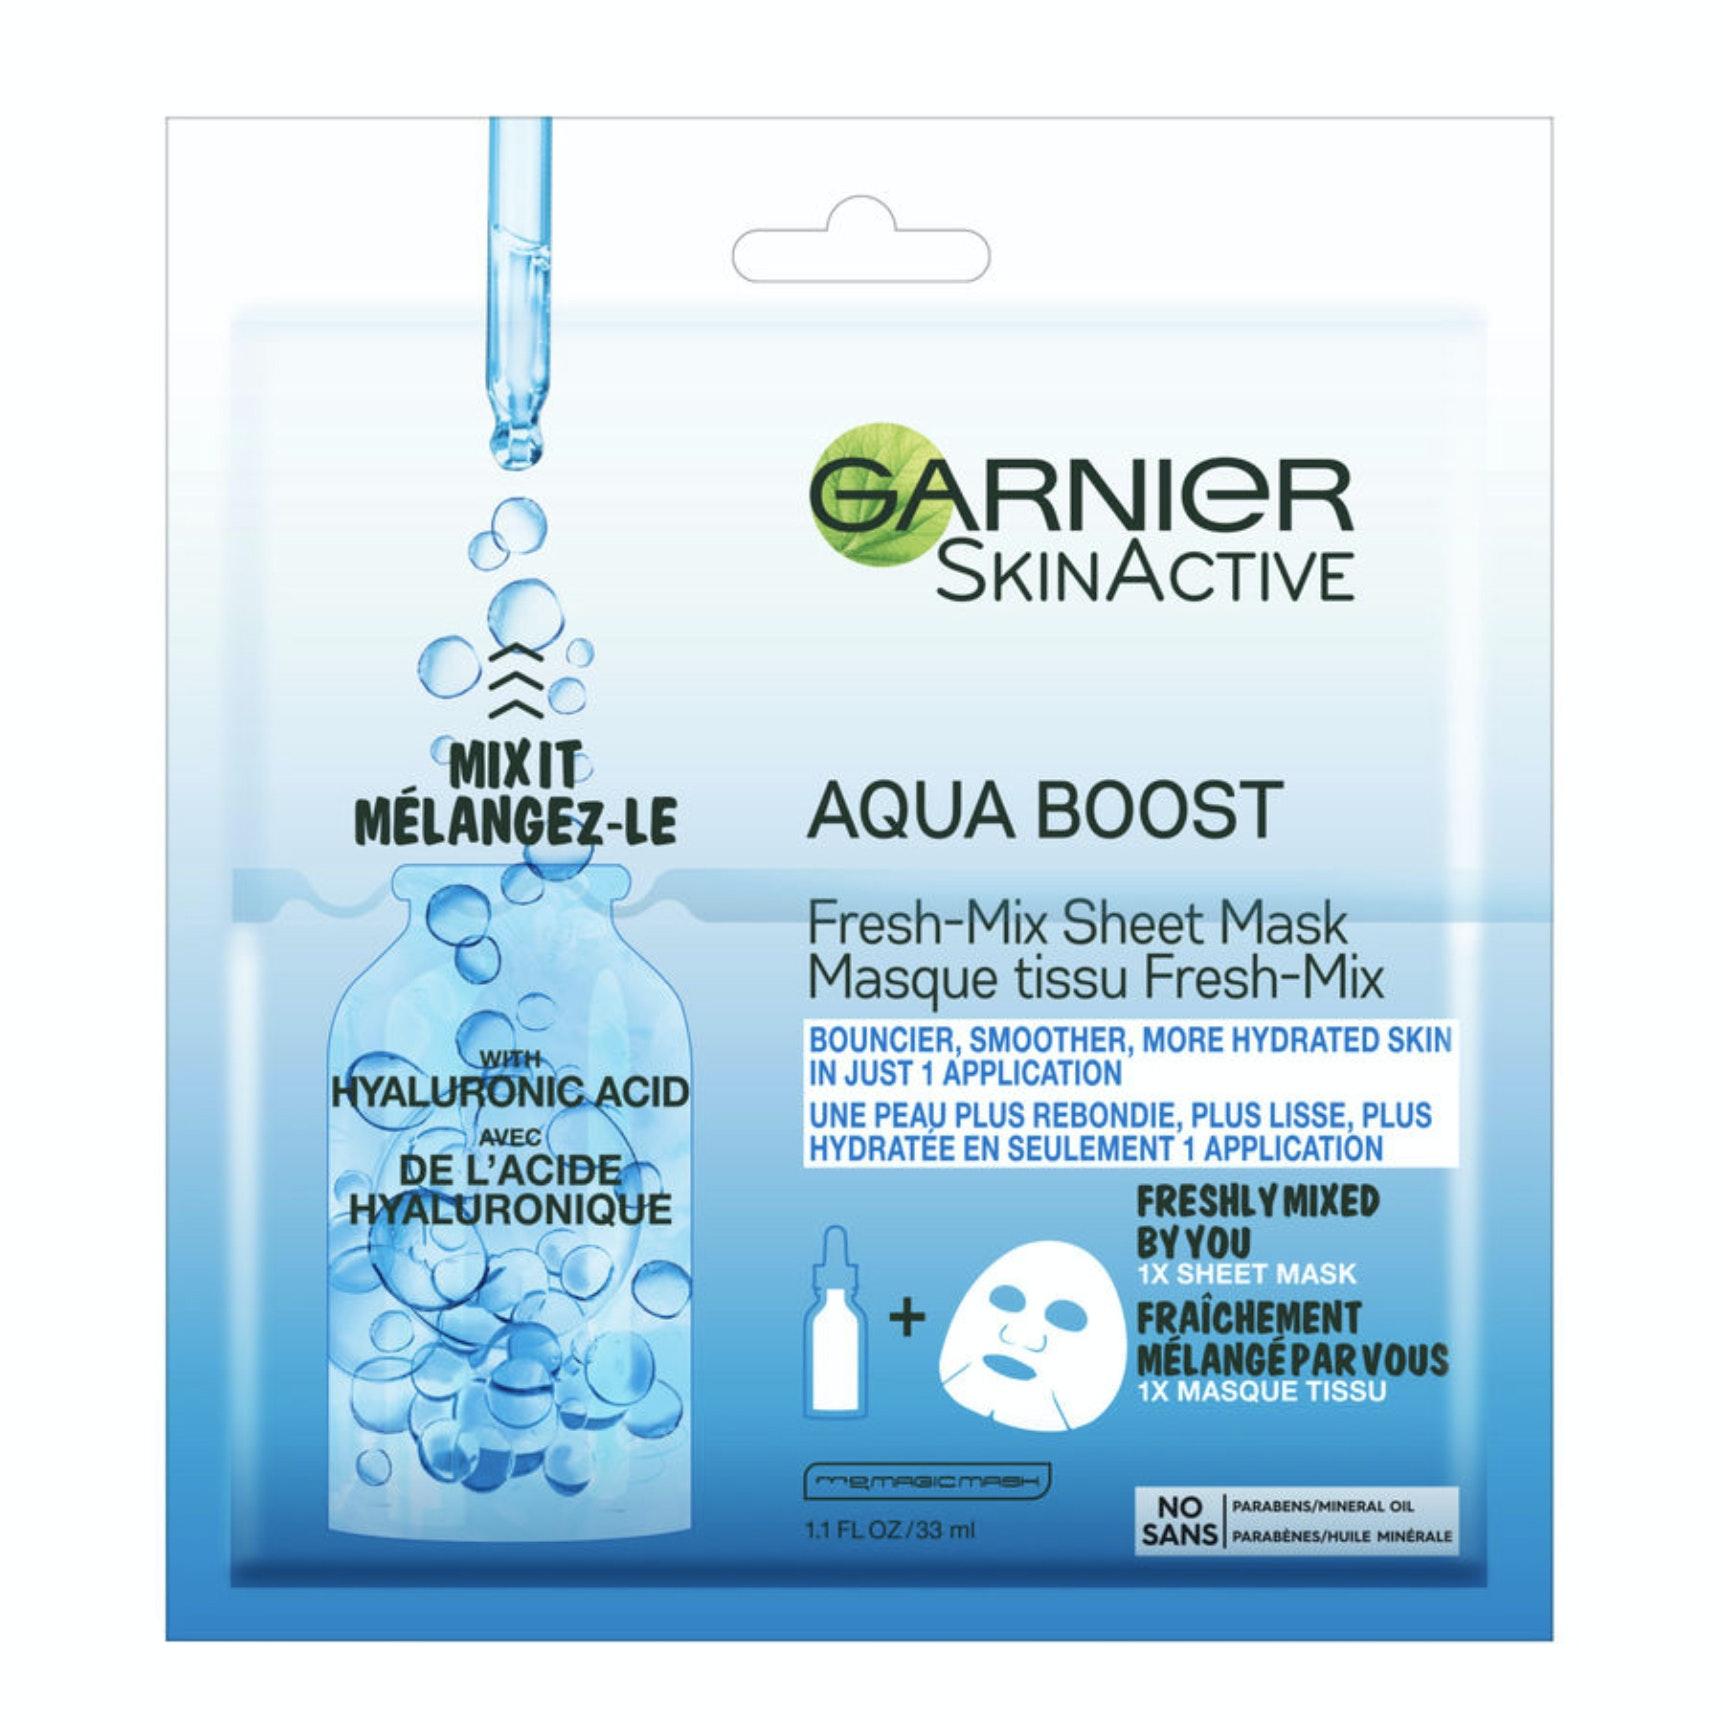 Garnier® SkinActive® Aqua Boost™ Fresh-Mix Sheet Mask